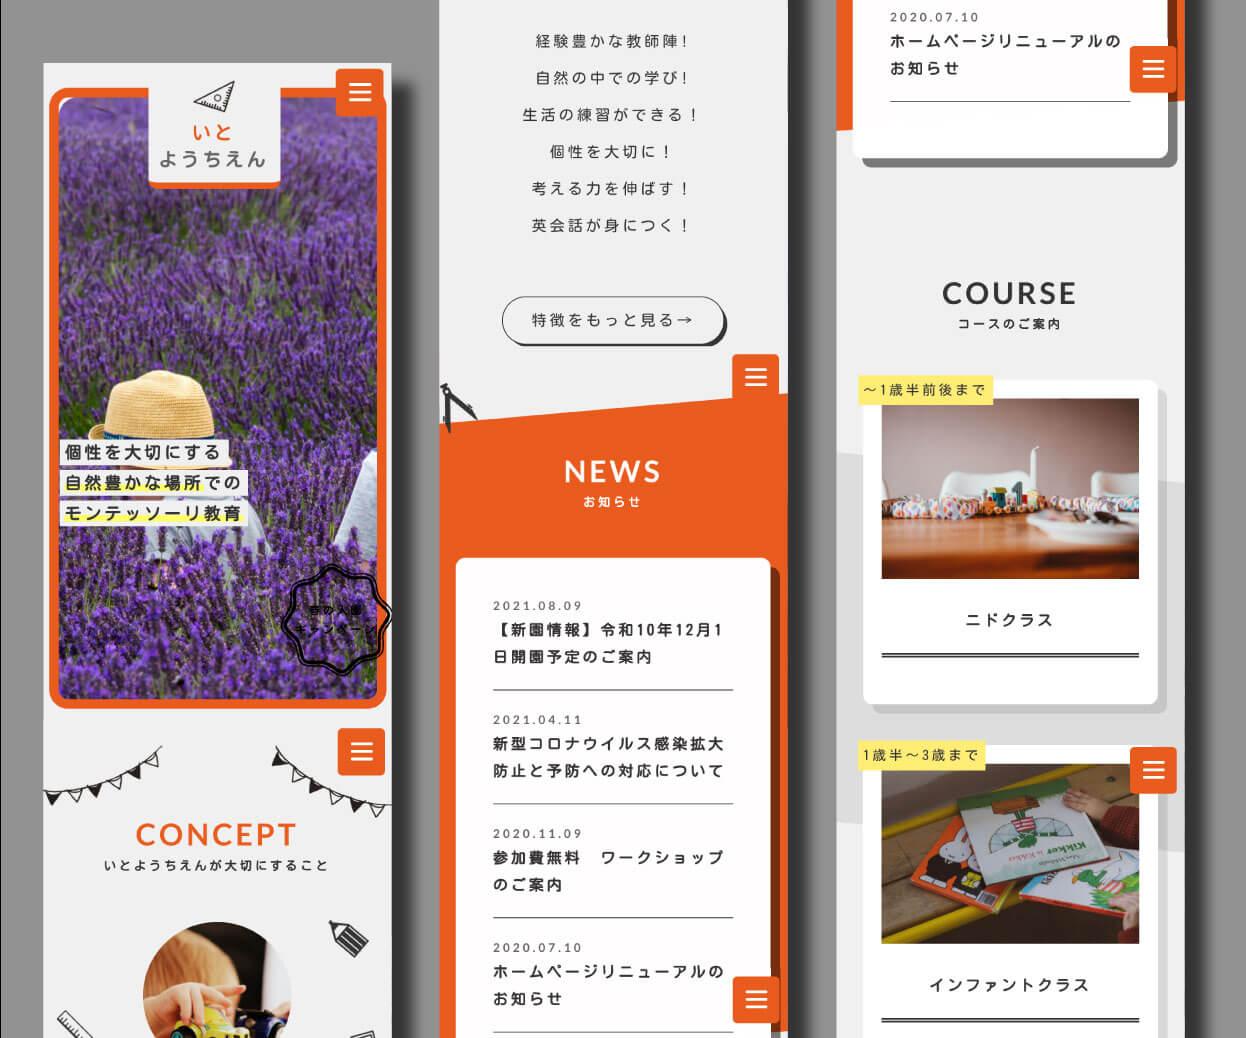 Itoyouchien smartphone01